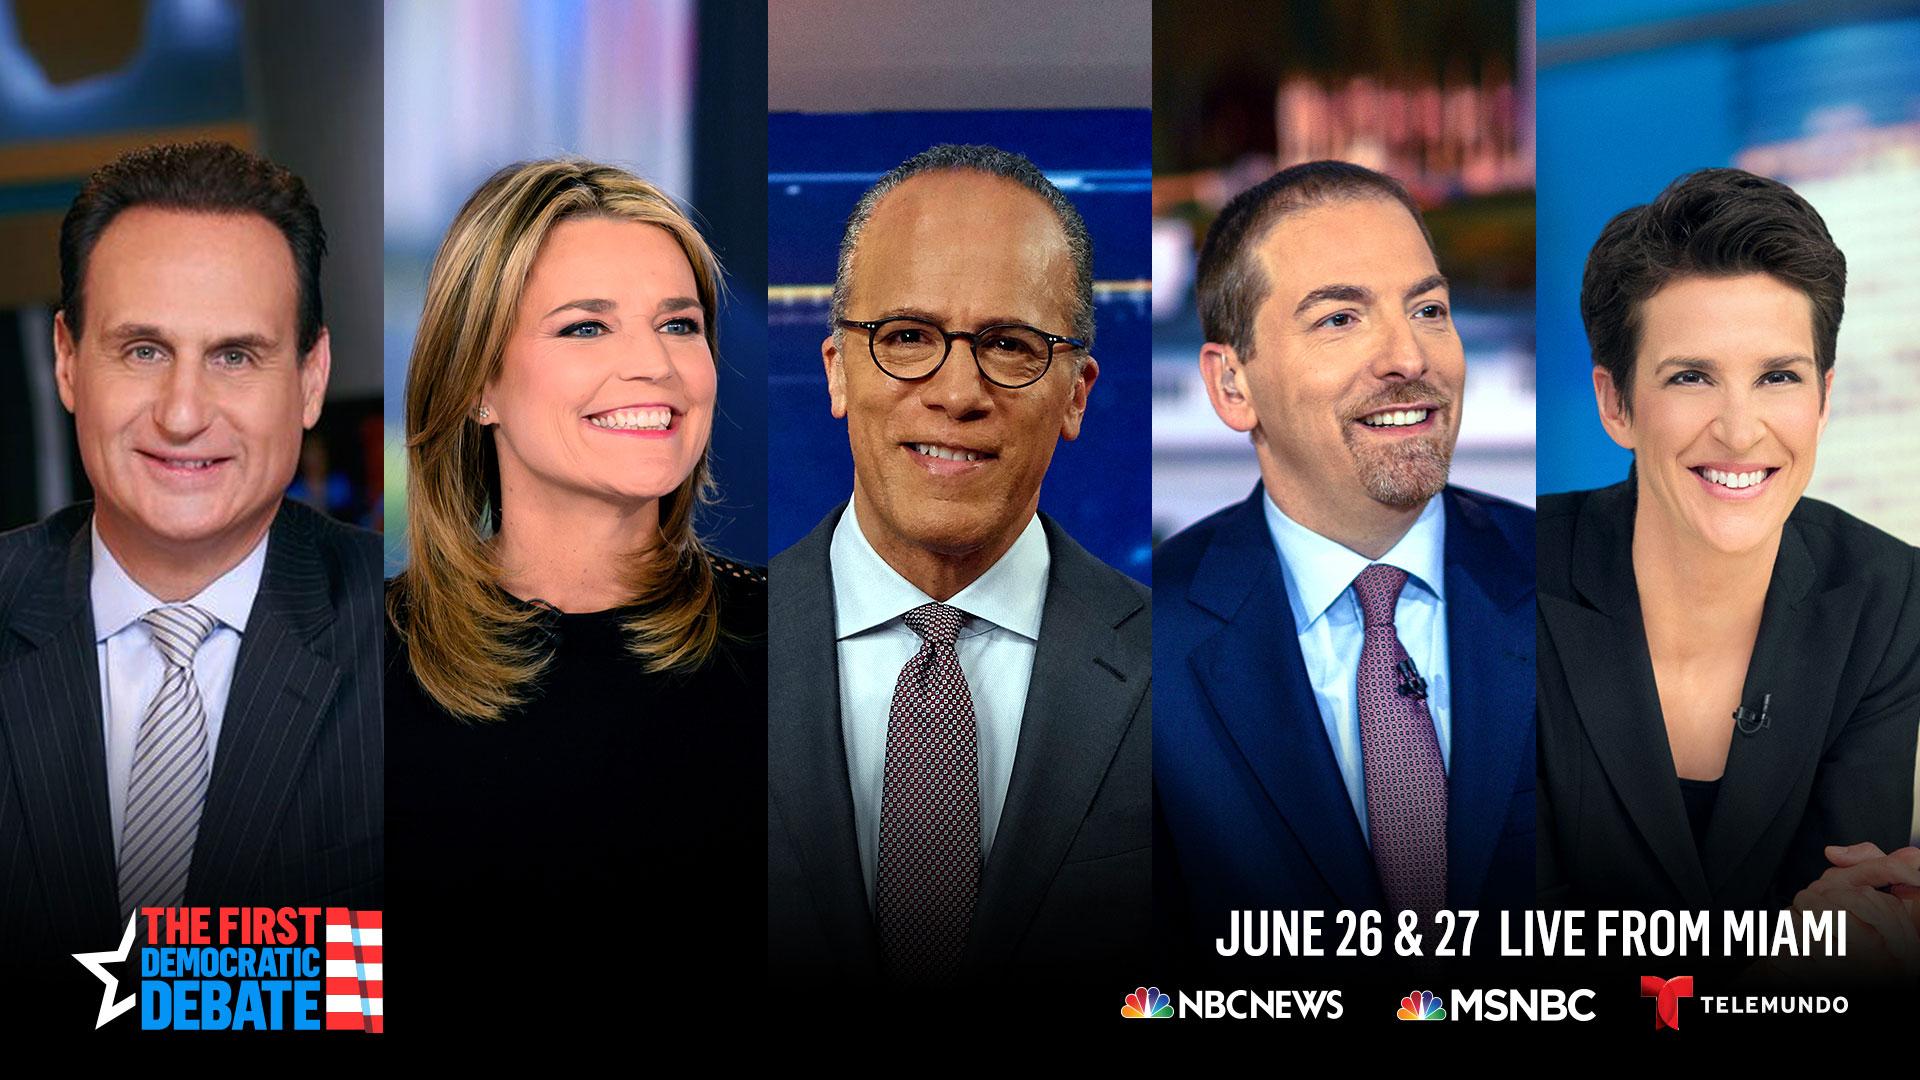 NBC Announces Moderators for First 2020 Debate